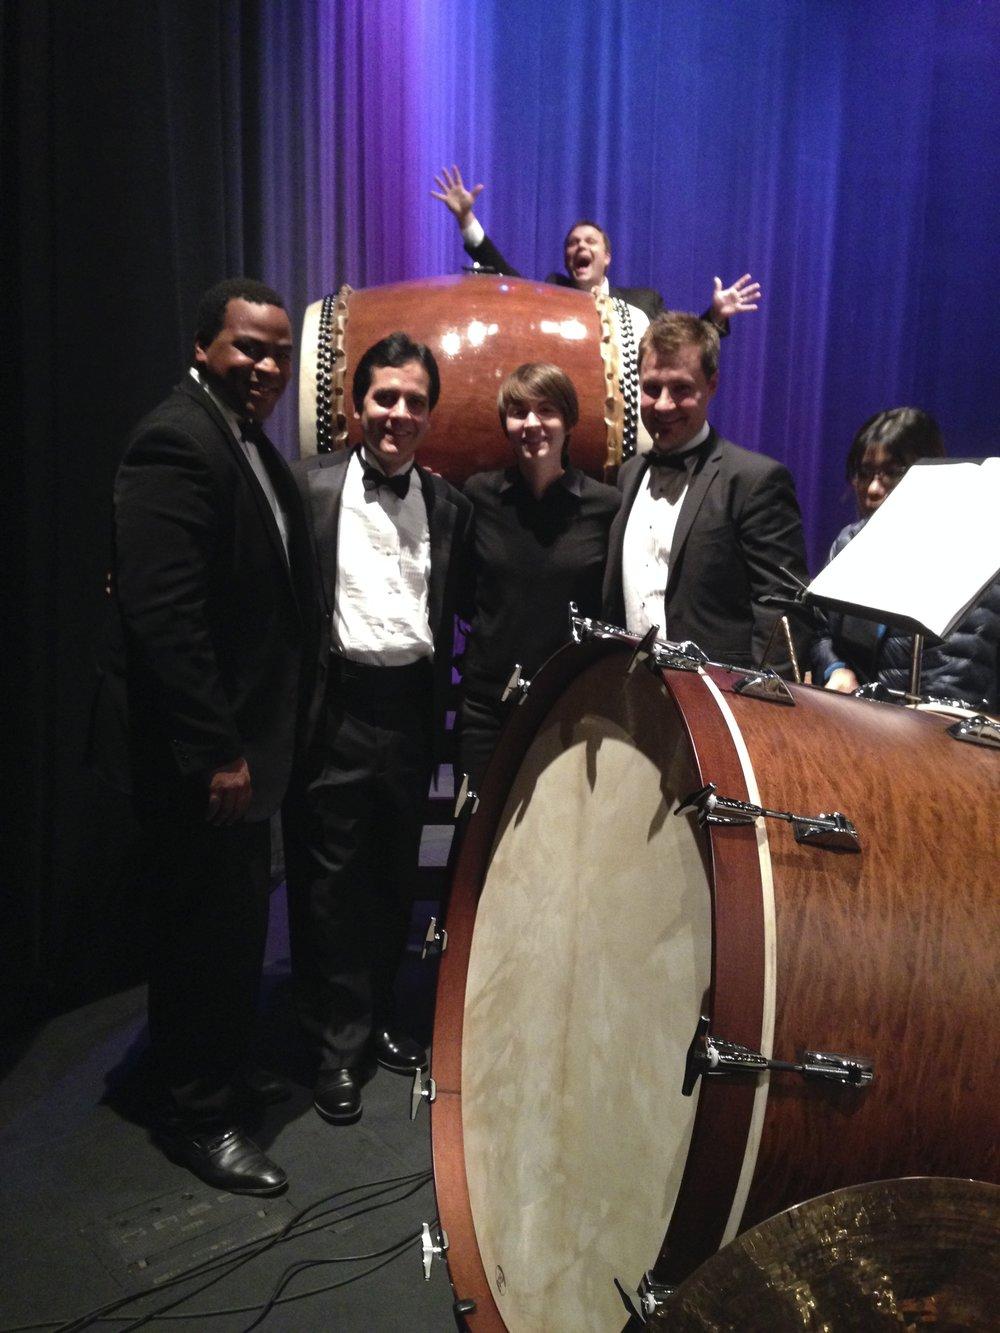 Pasadena Master Chorale Section